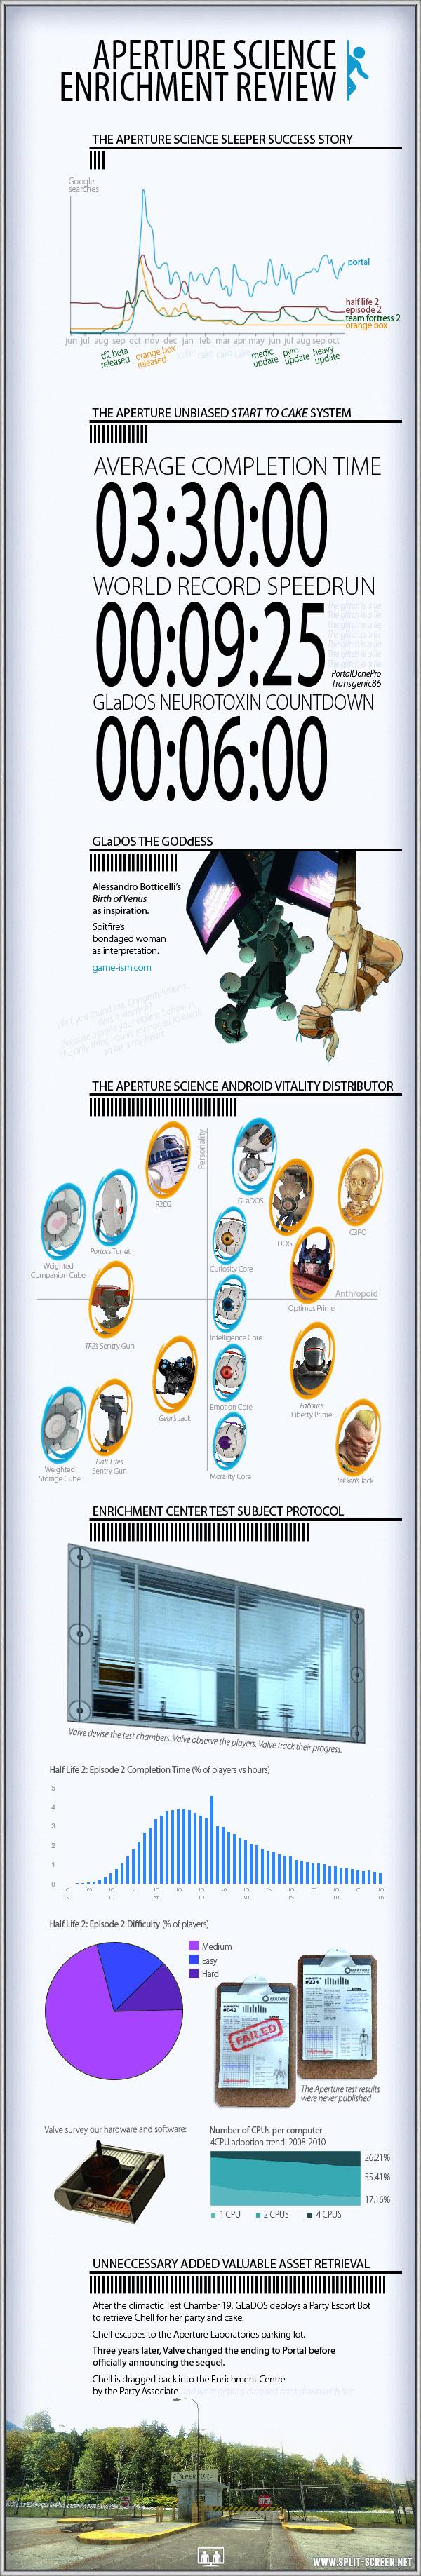 Portal Infographic